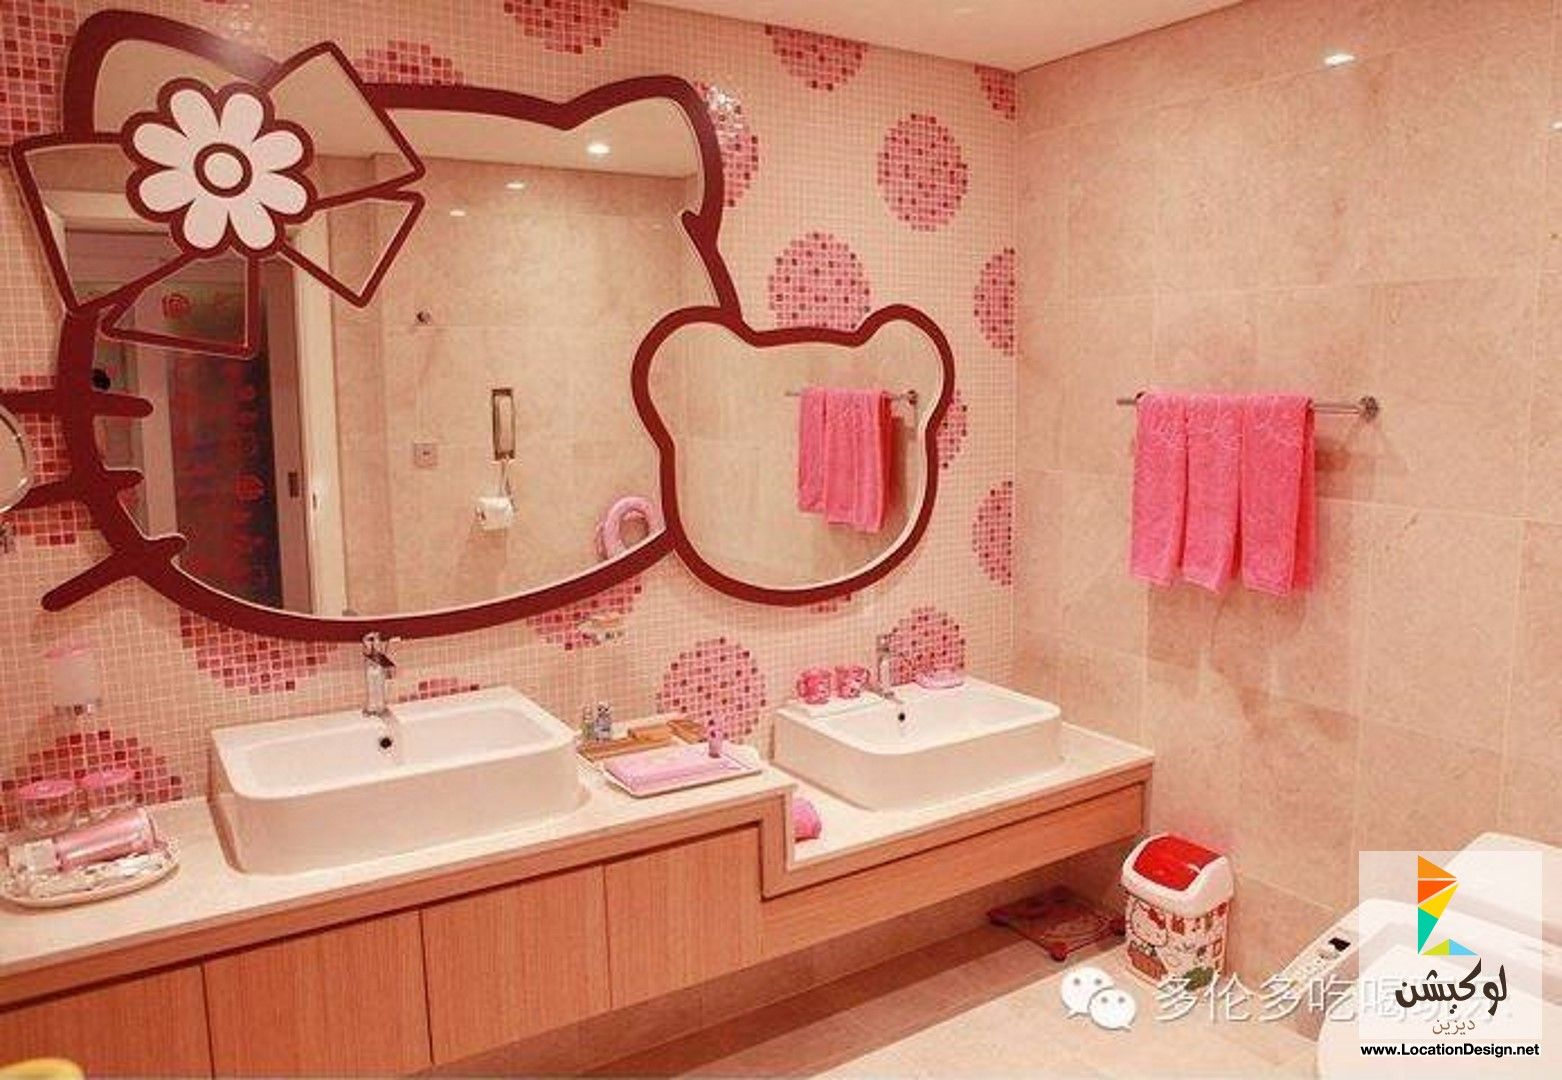 أجمل تصاميم ديكورات حمامات مودرن للبنات 2015 لوكيشن ديزاين تصميمات ديكورات أفكار جديدة Hello Kitty Bathroom Retro Pink Bathroom Round Mirror Bathroom